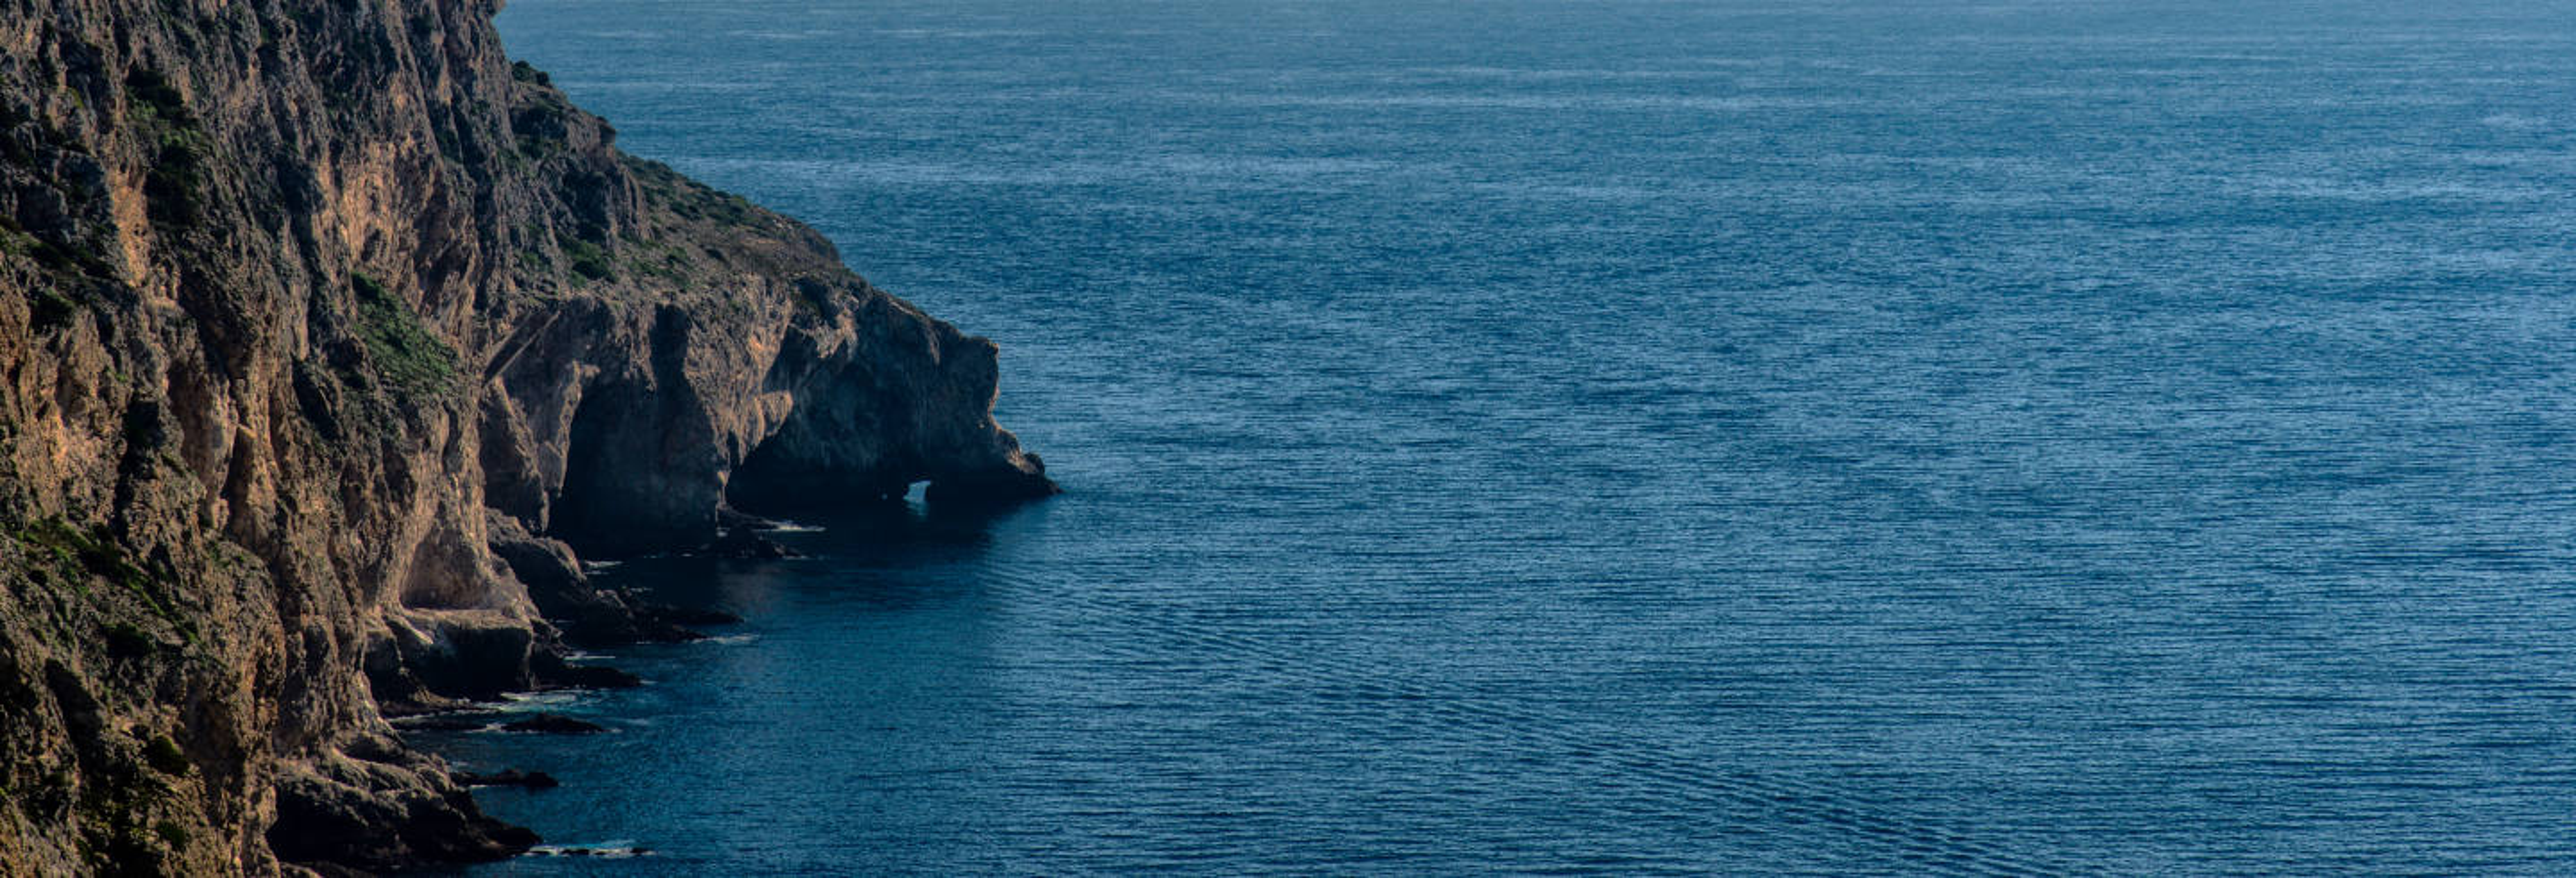 Passeio de barco pelas grutas do Cabo Espichel